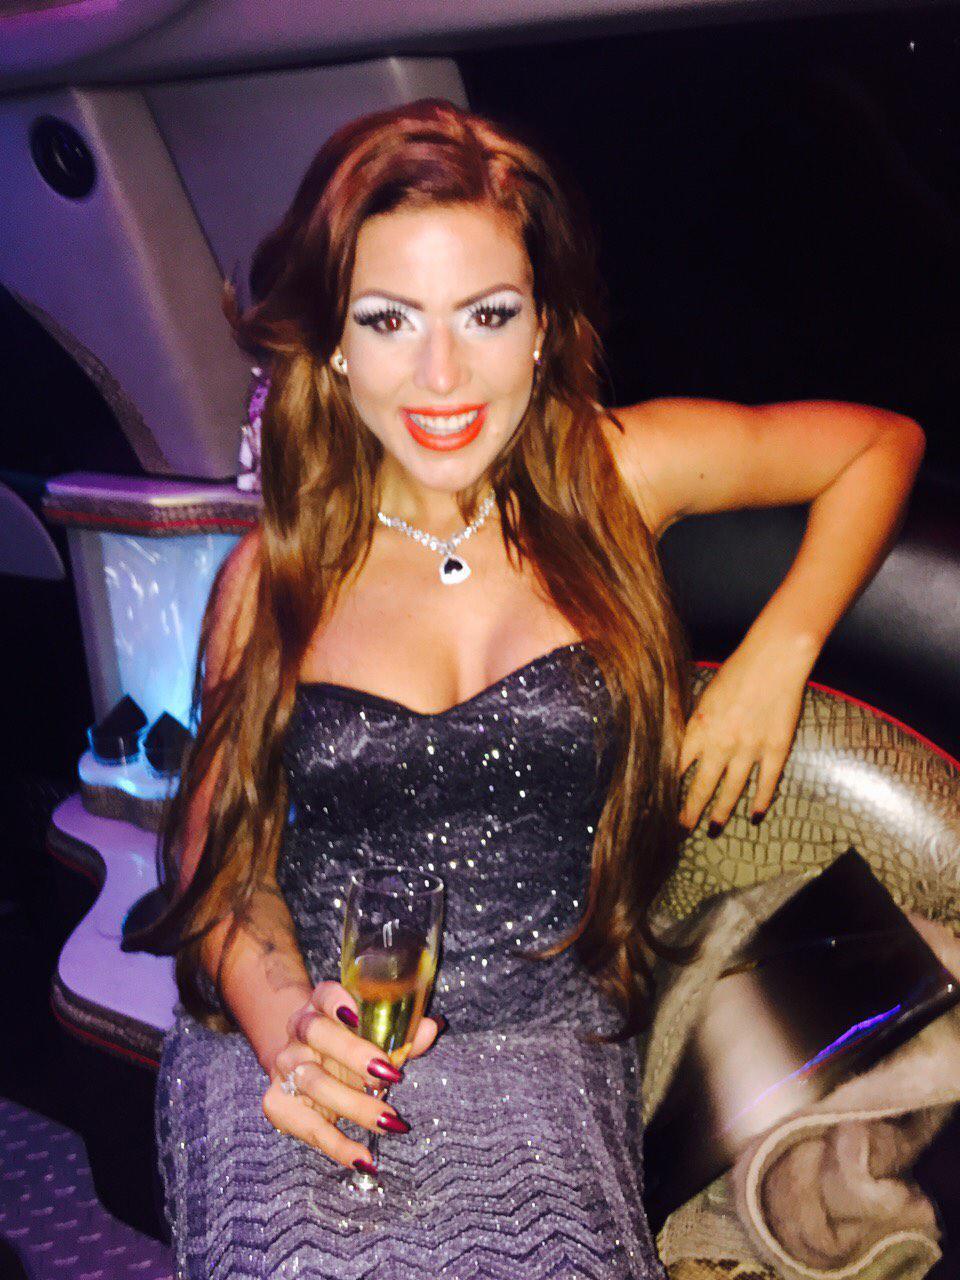 Valentina Erotikmodel